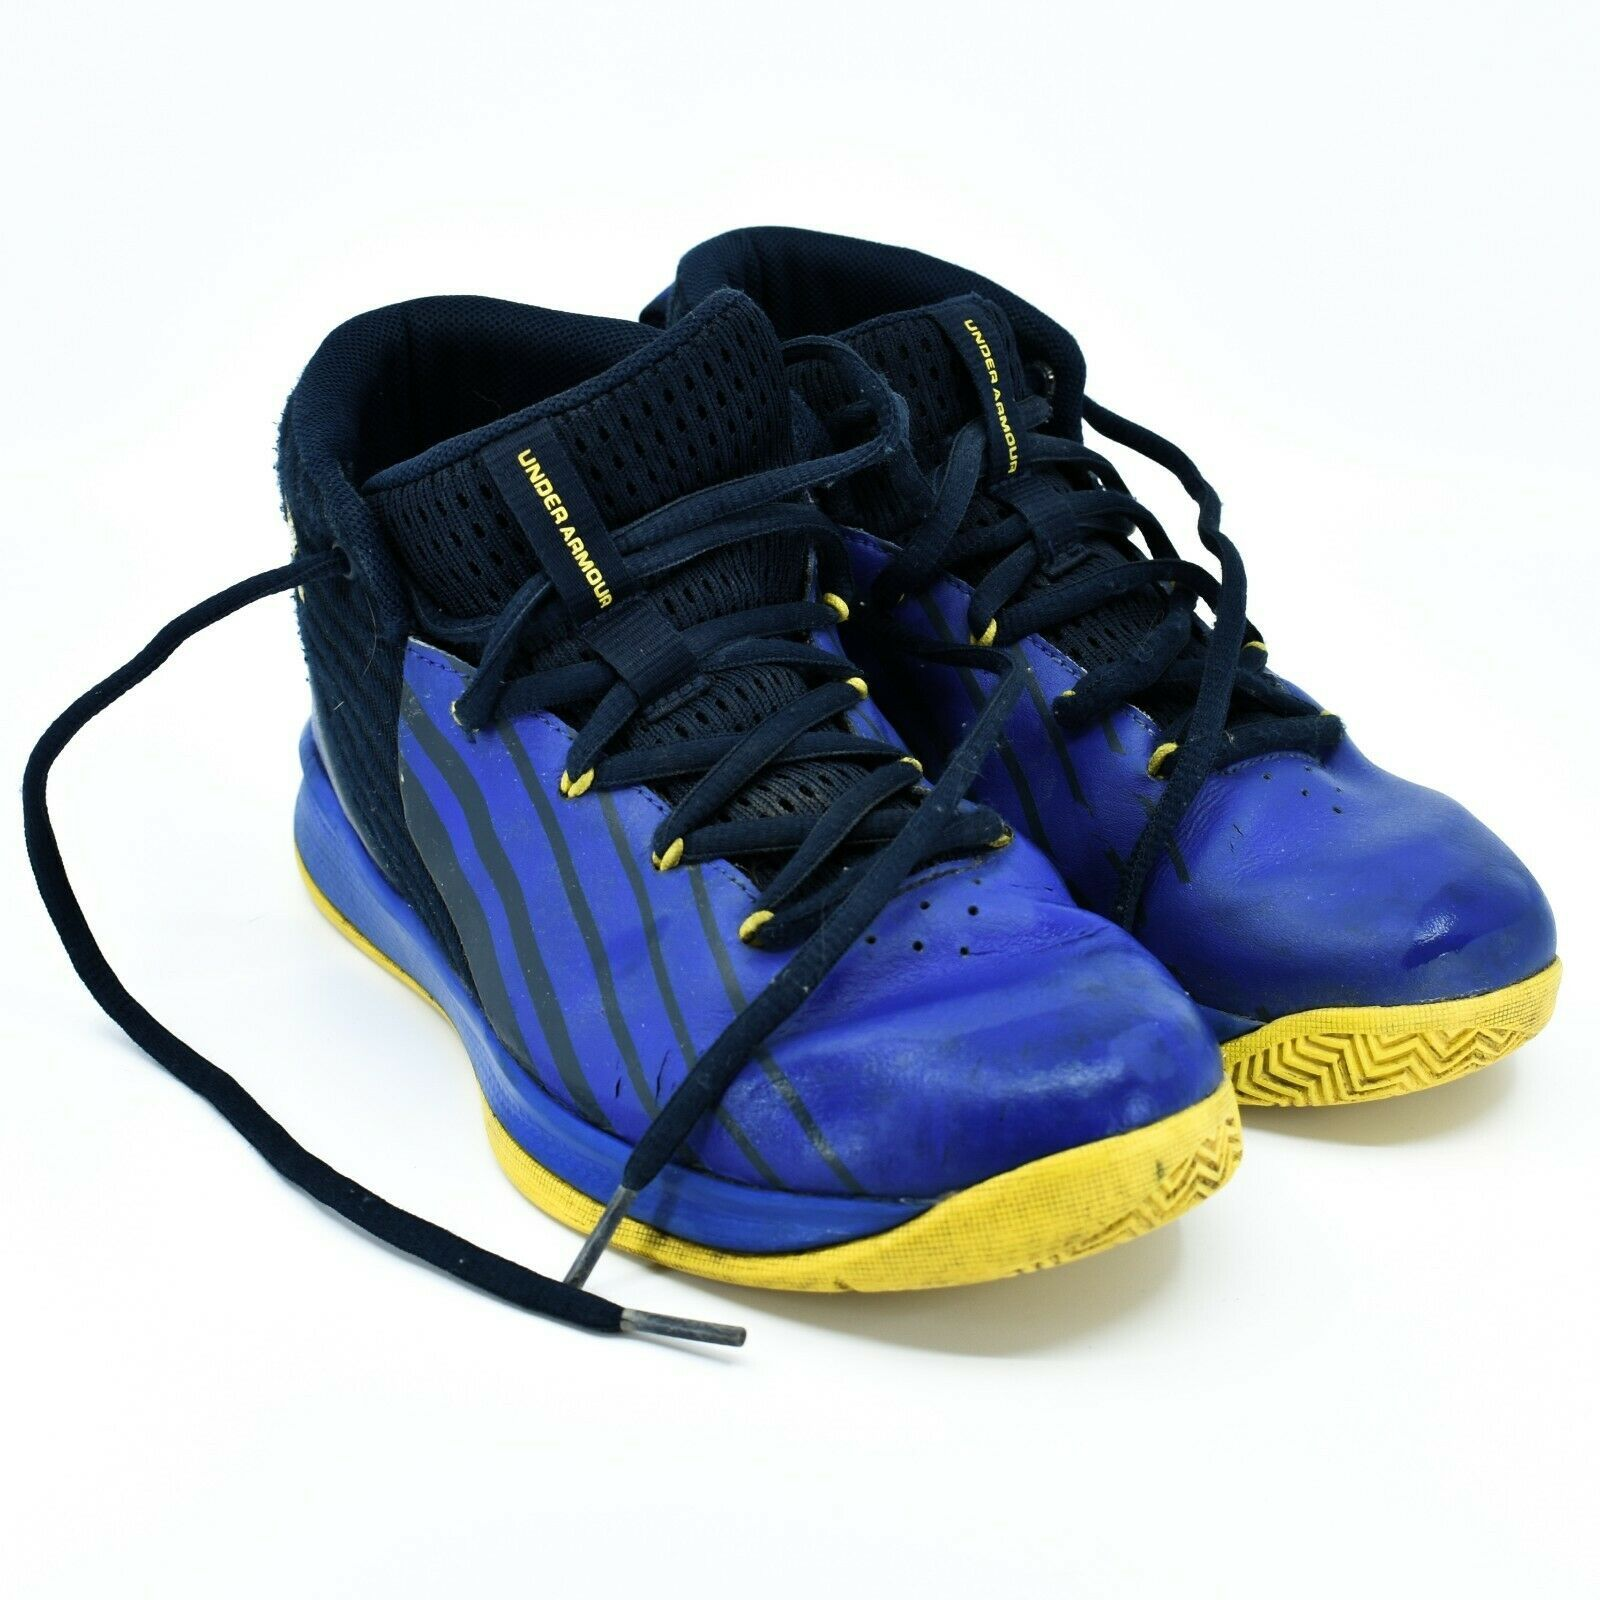 Under Armour Boys' Pre-School UA Lockdown 3 Basketball Shoes Youth Size 3Y